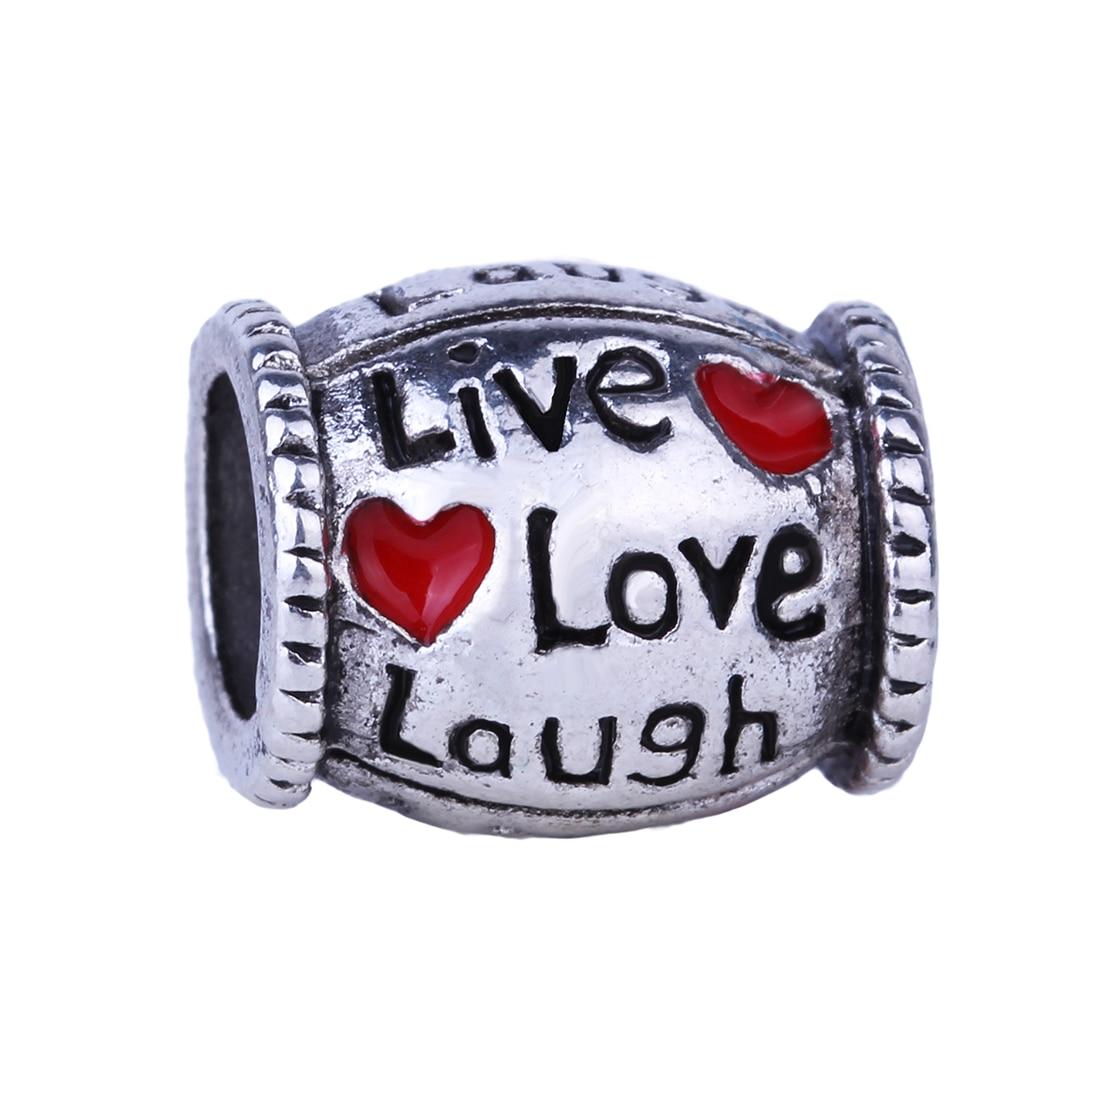 Free Shipping 1pc <font><b>Live</b></font> <font><b>Love</b></font> Laugh Silver Bead Charm European <font><b>Enjoy</b></font> <font><b>Life</b></font> Heart Fashion Bead Fit Pandora Bracelets & Necklace